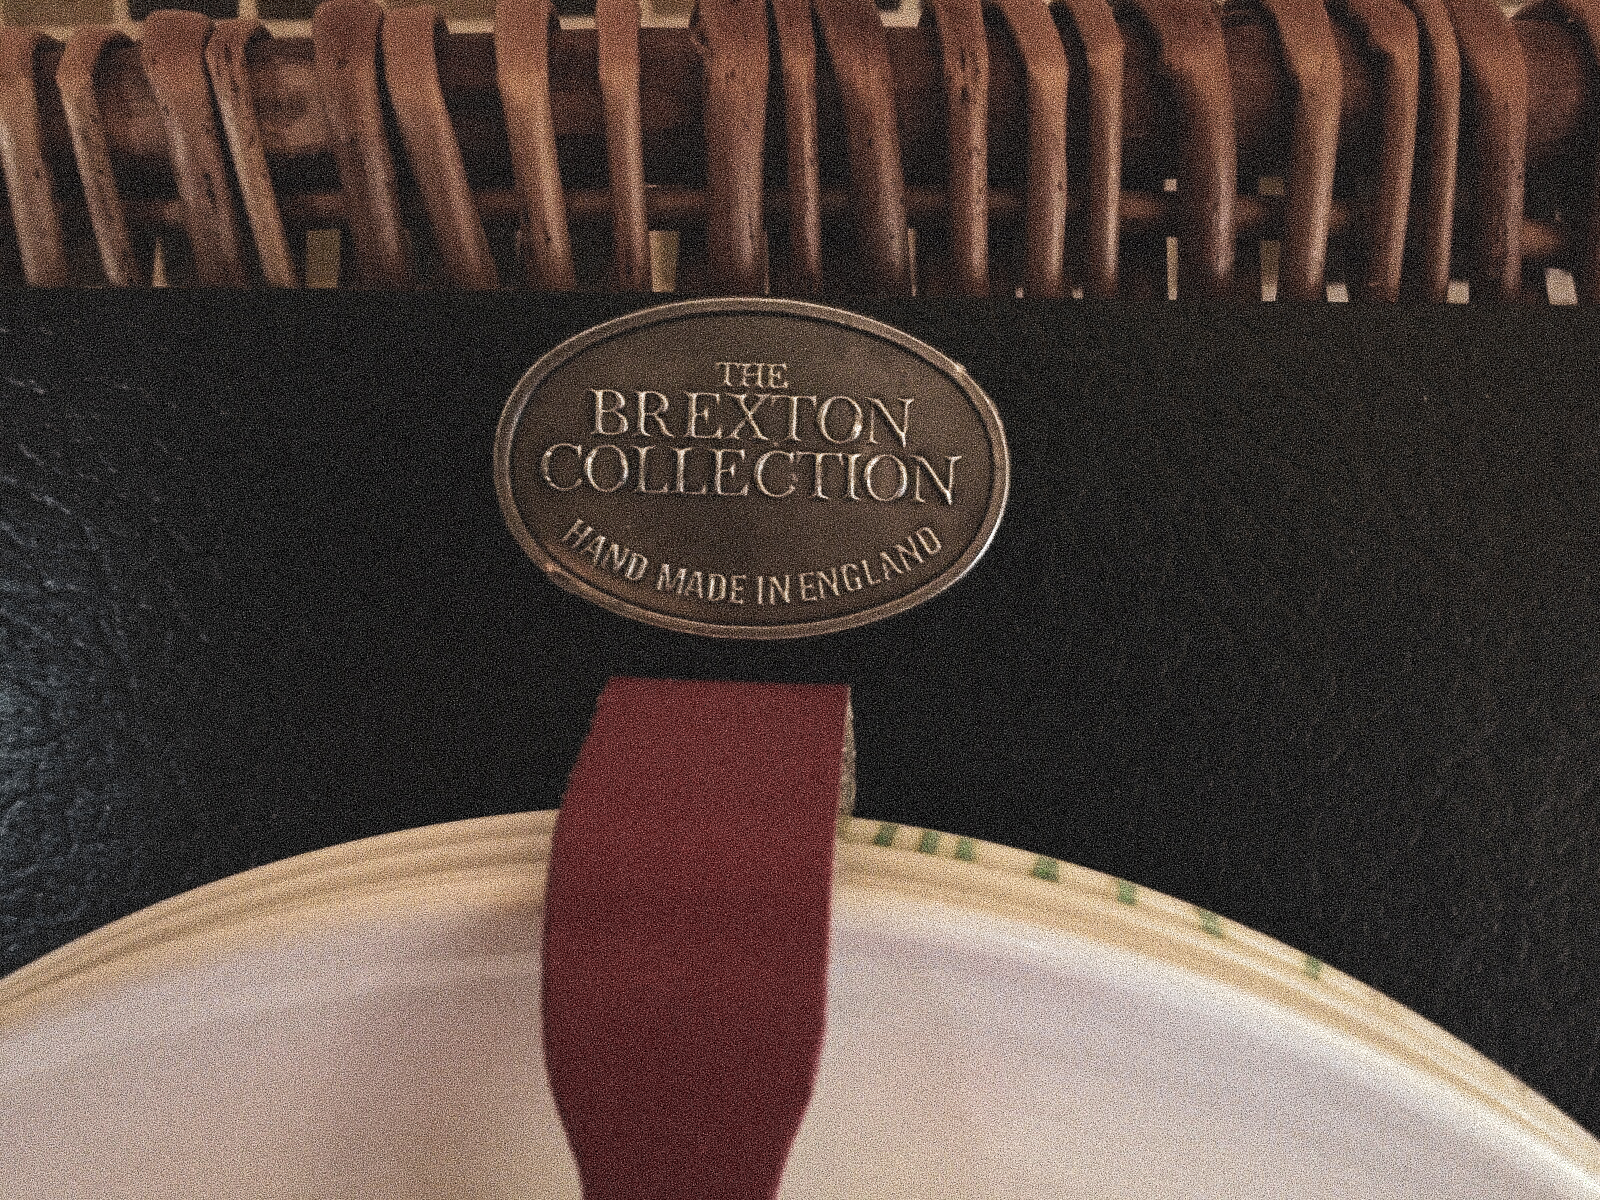 Brexton Picnic Hamper